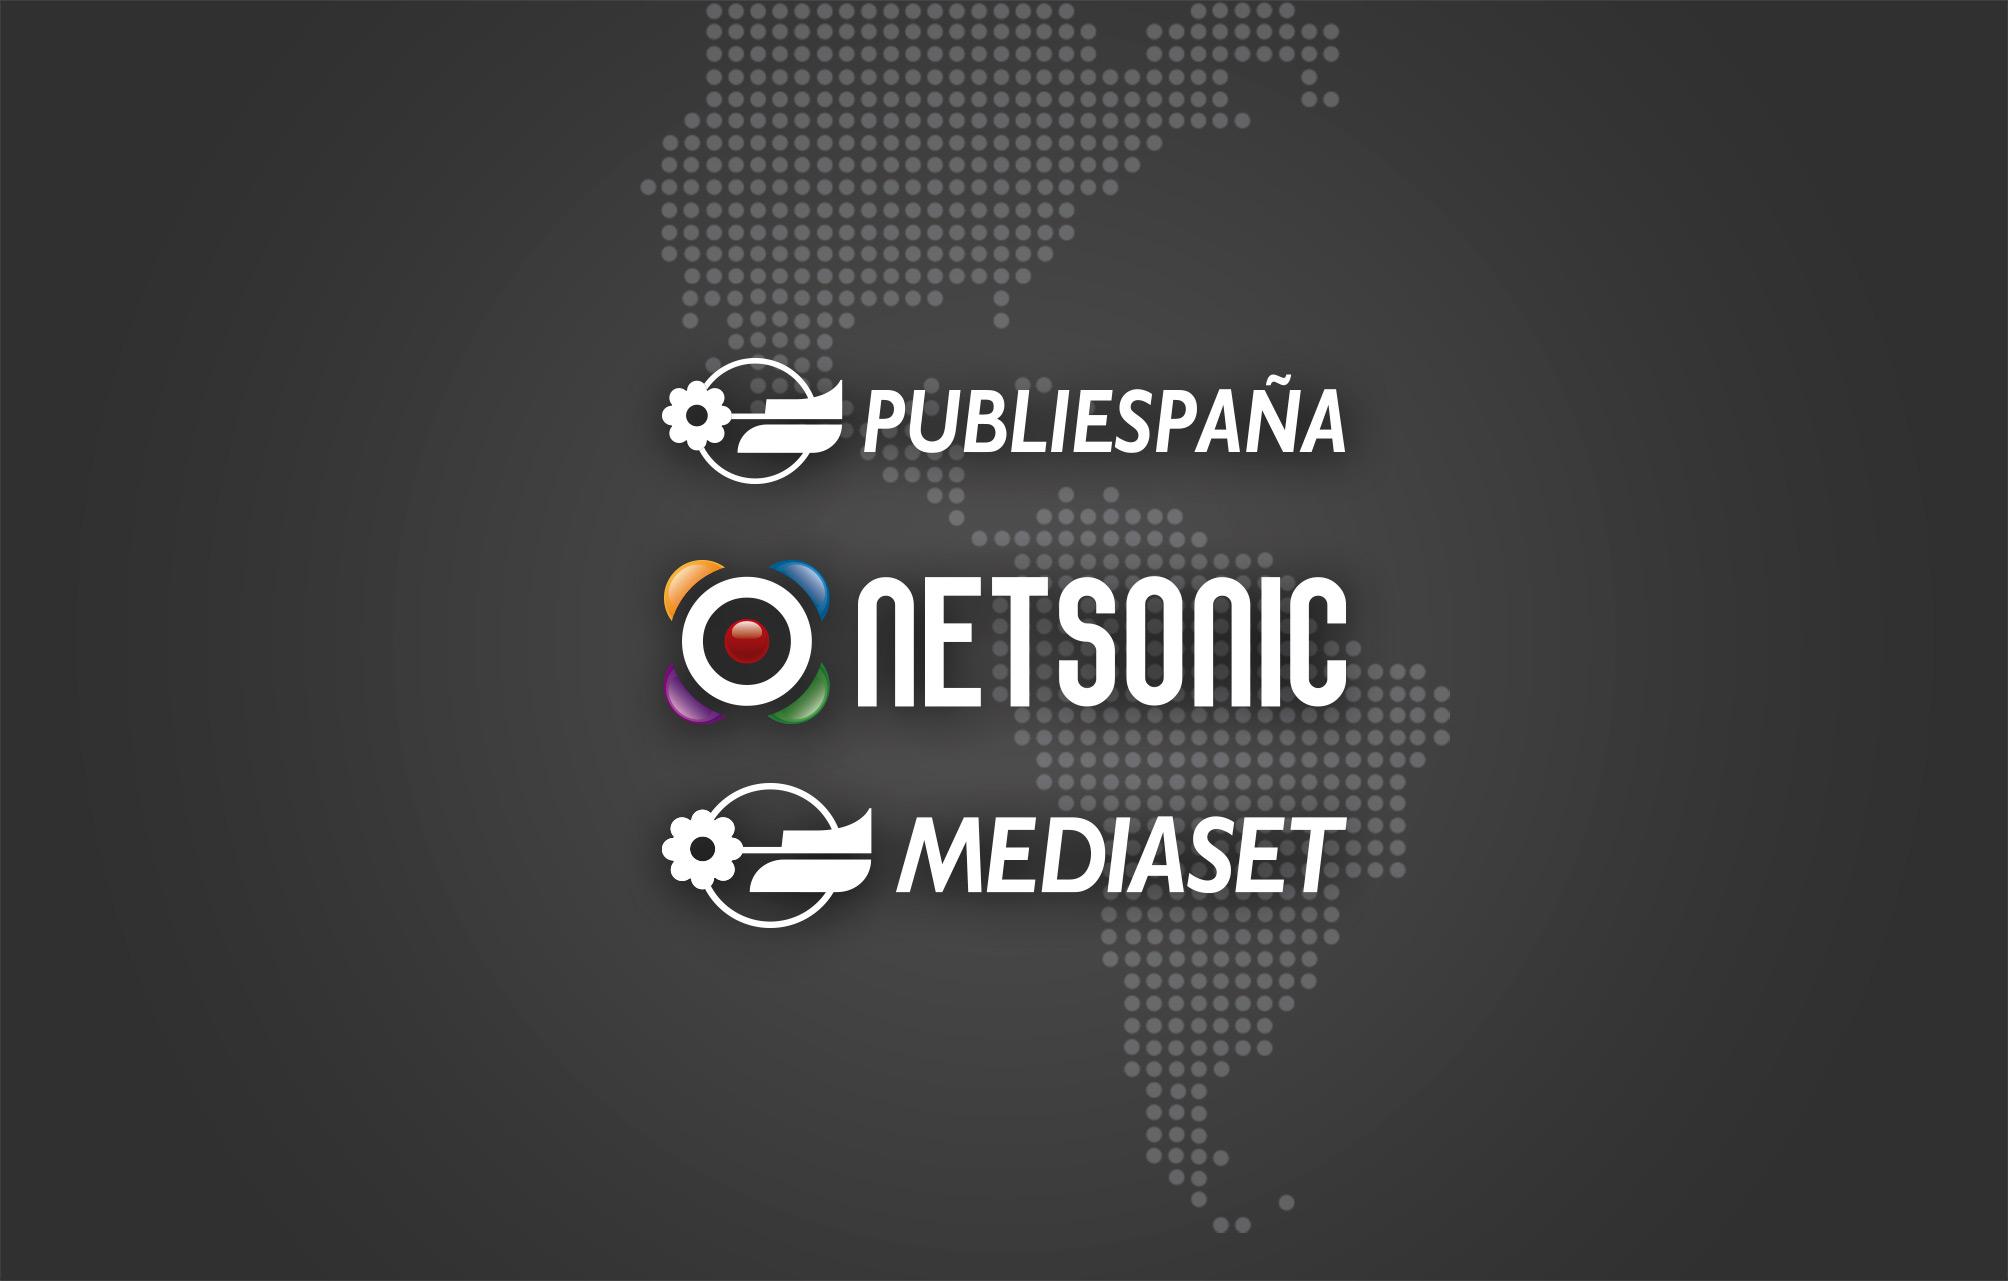 Publiespaña da el salto al mercado publicitario online latinoamericano con Netsonic